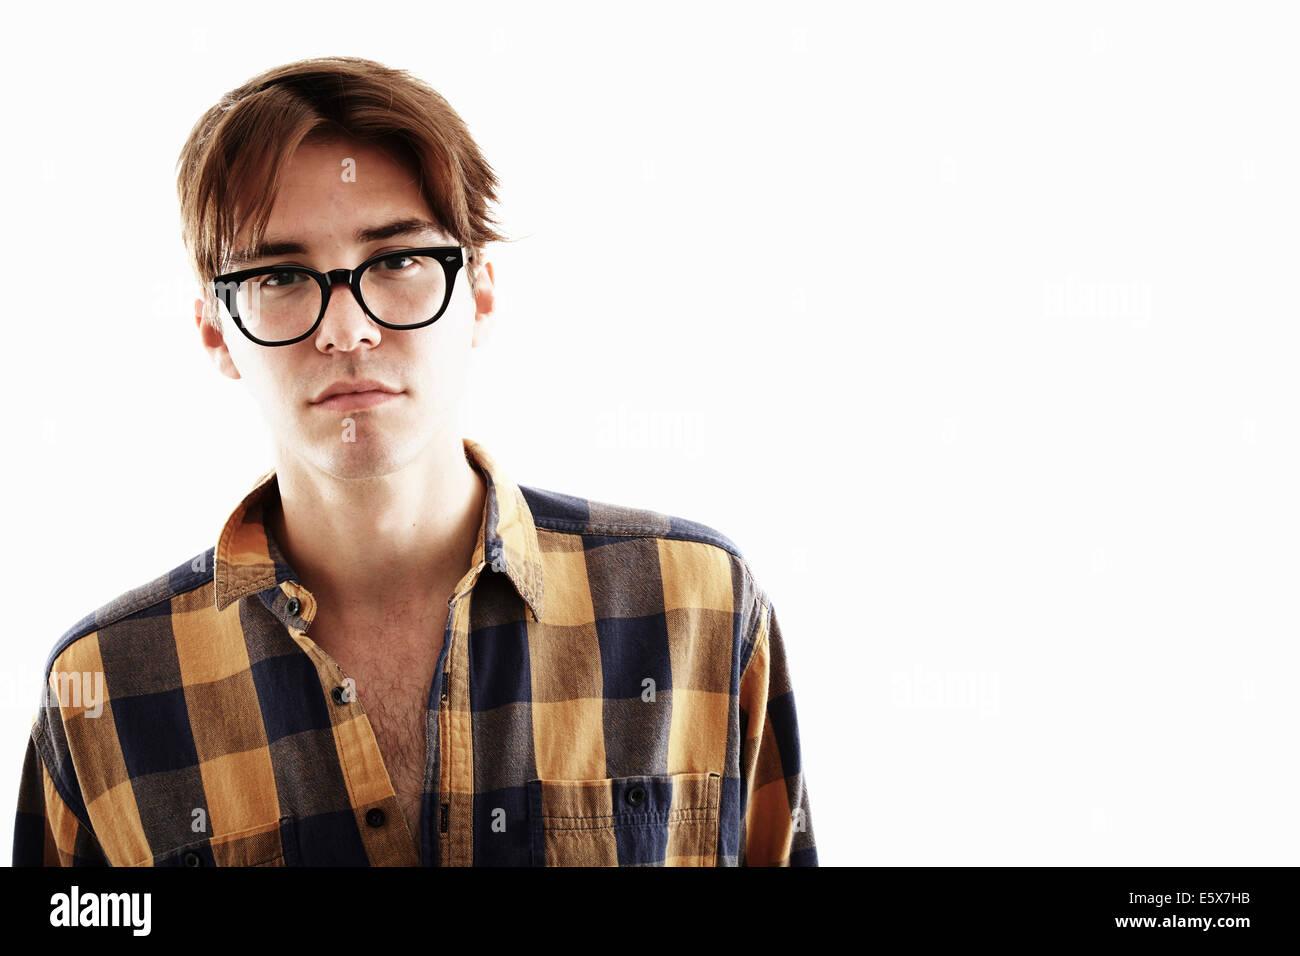 Studio portrait of young man in eyeglasses Stock Photo